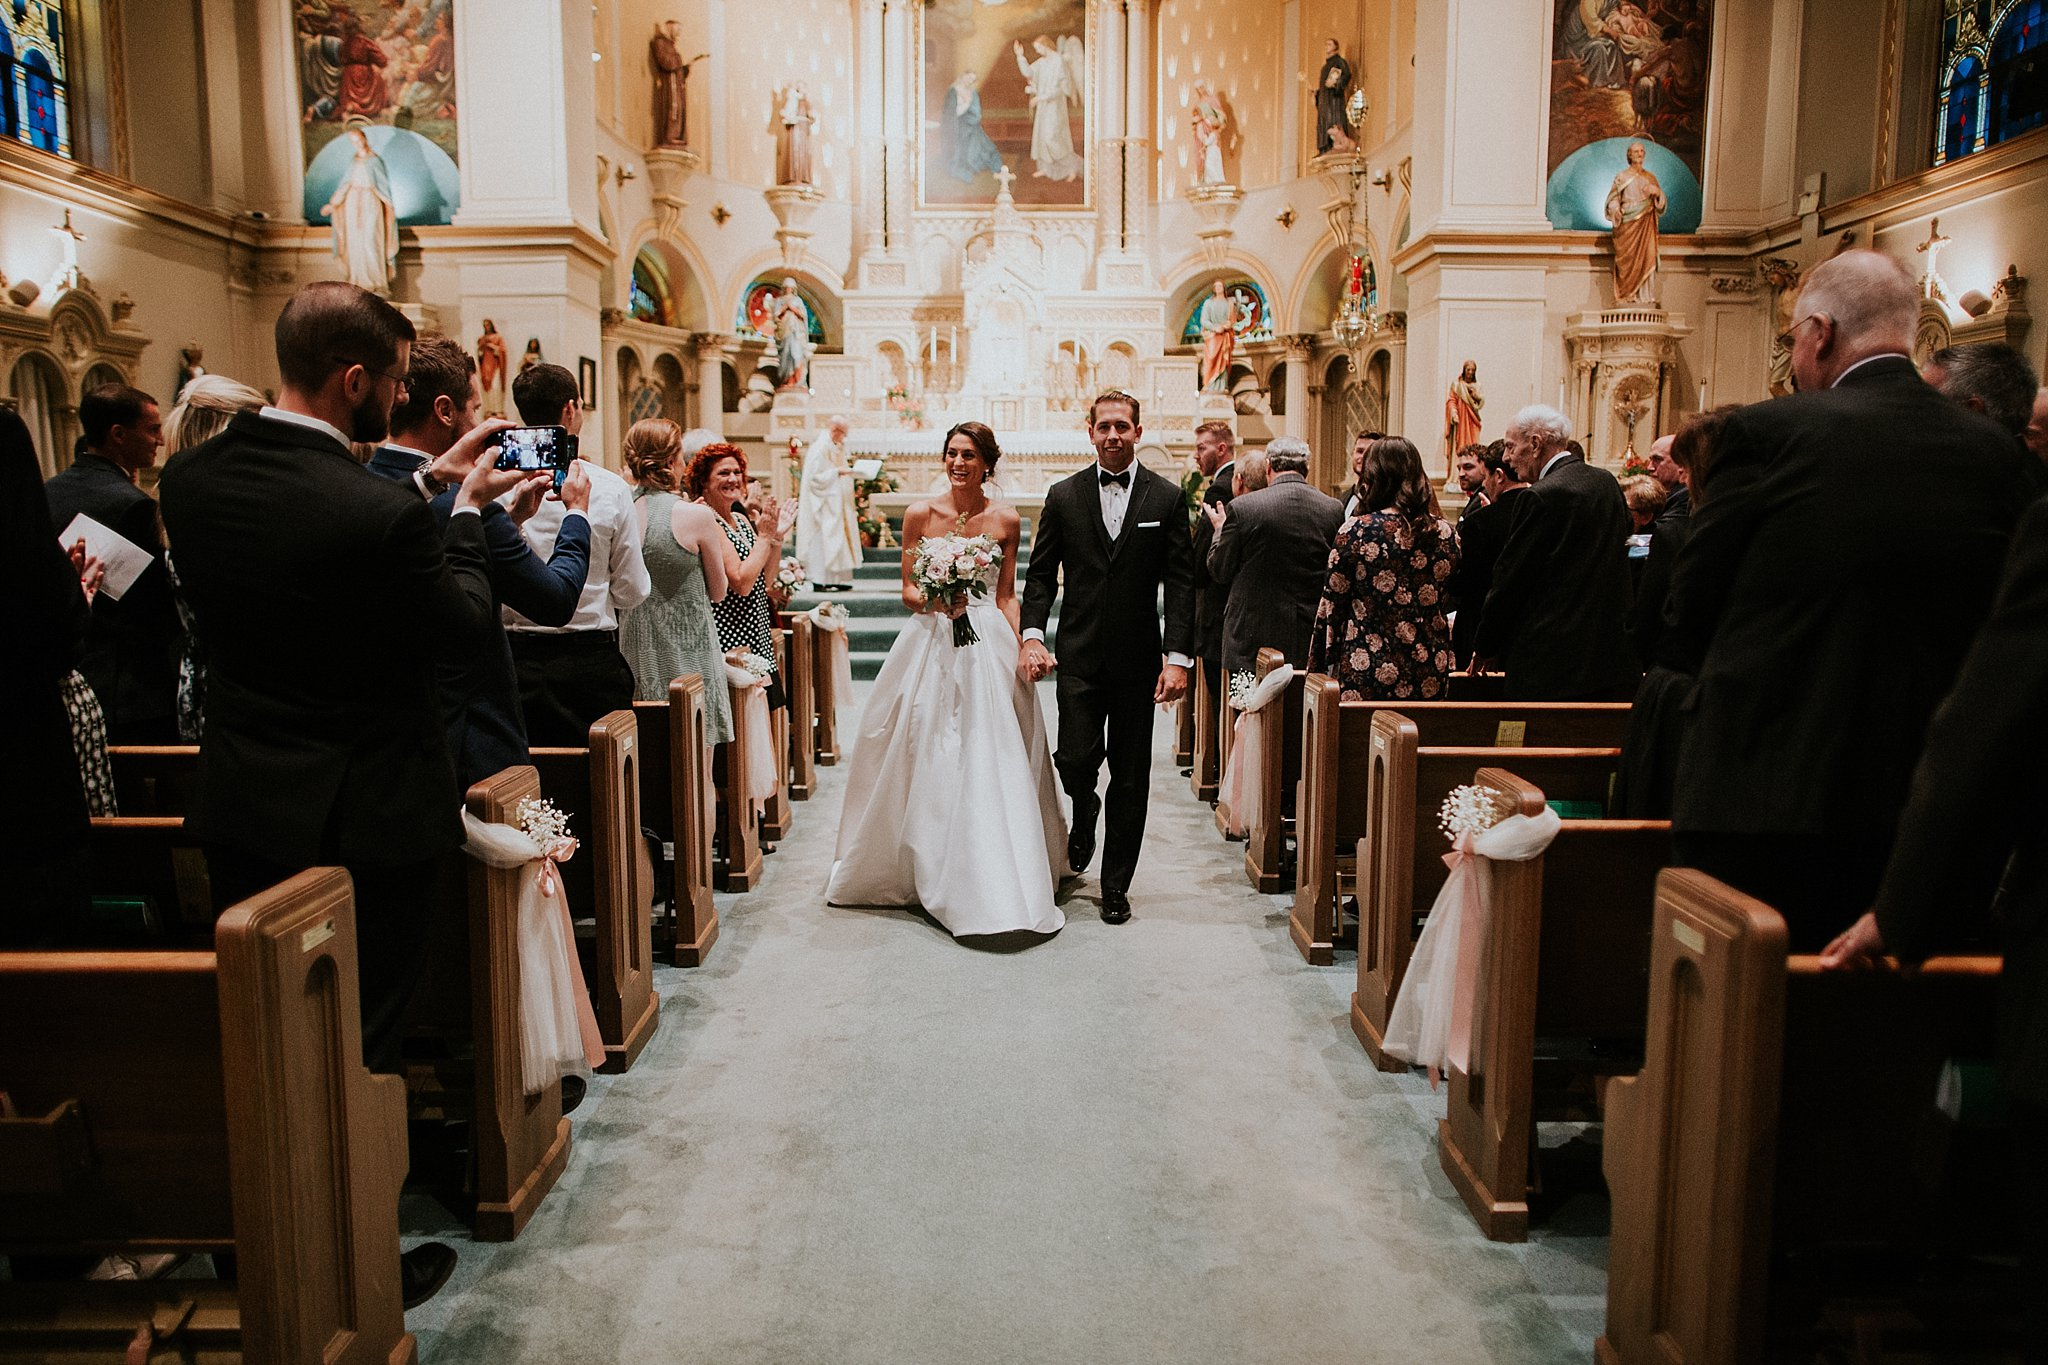 Matt-Lauren_St-Marys_Hilton-City-Center-Milwaukee-Wedding_liller-photo_0028.jpg